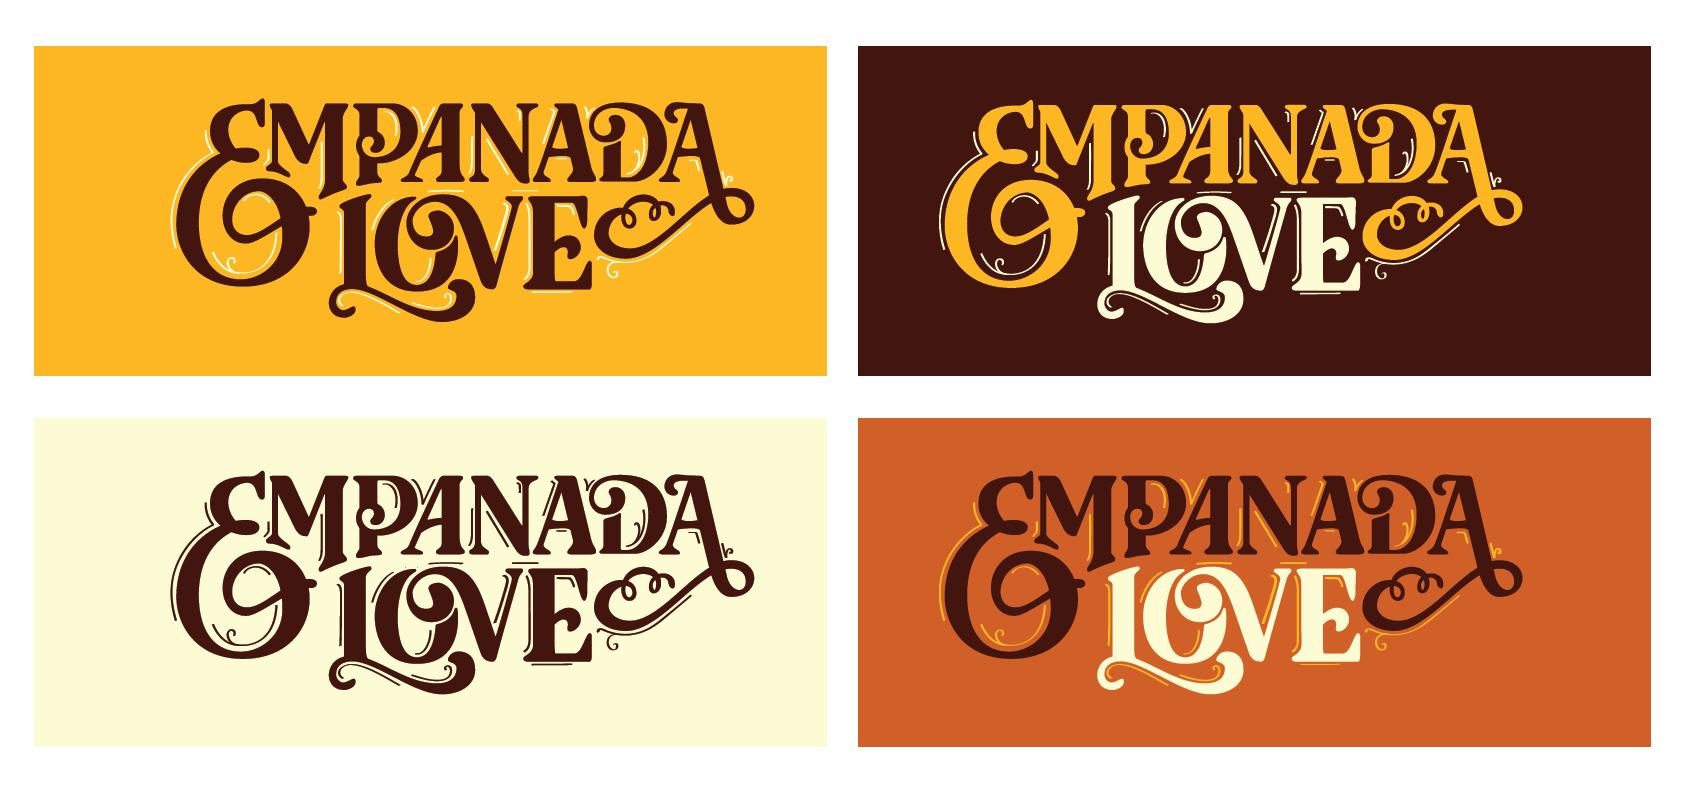 empanda love – Artboard 2@2x